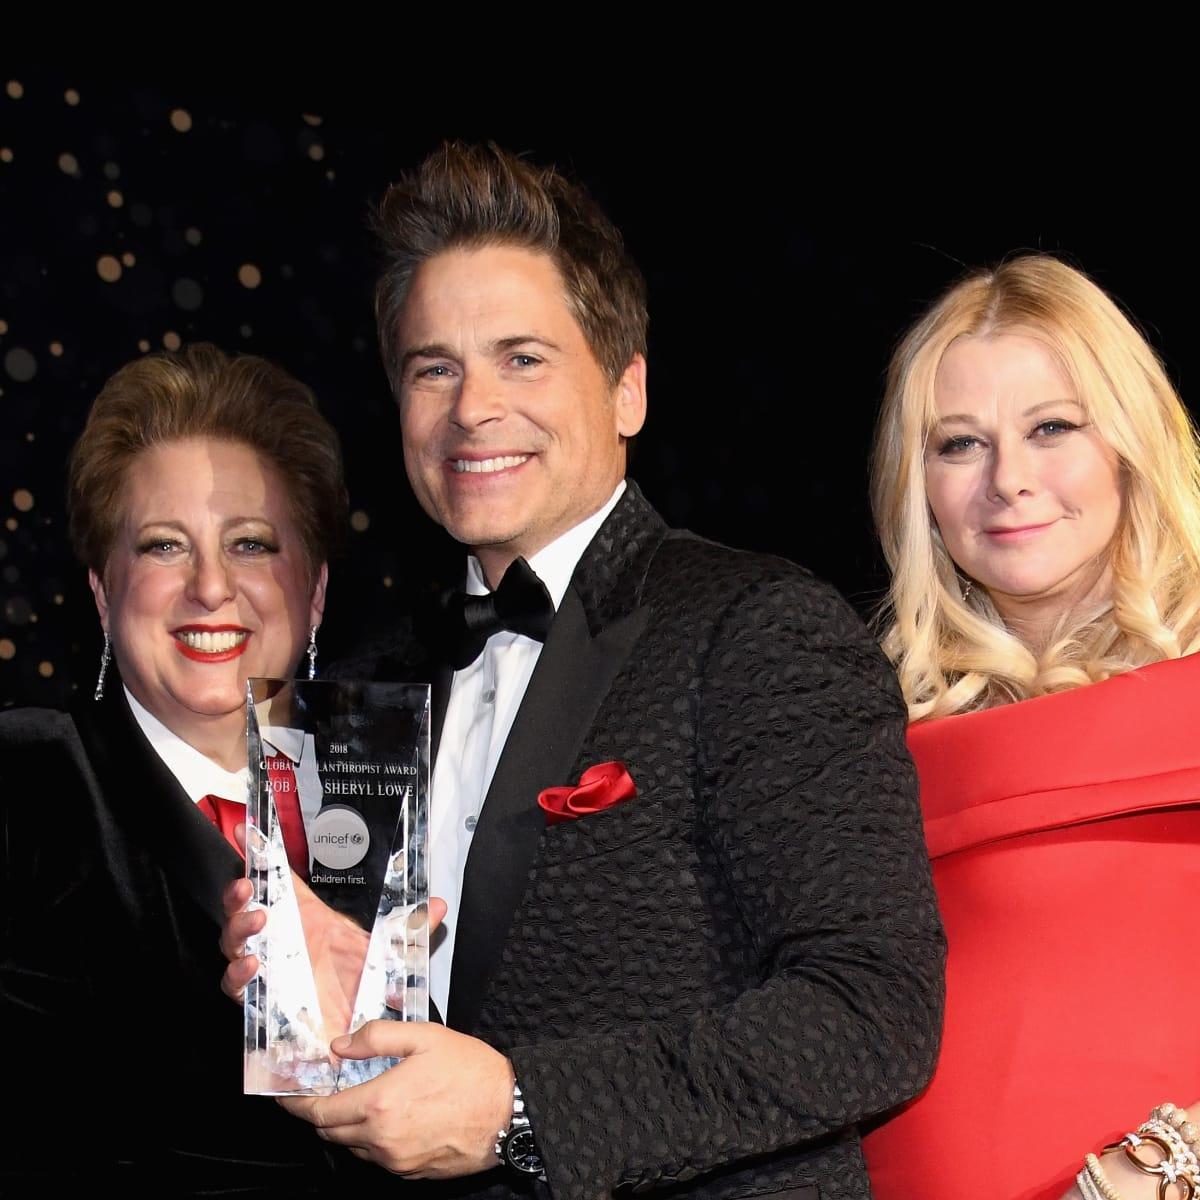 Rob Lowe, Sheryl Lowe, Caryl Stern, Unicef Gala 2018